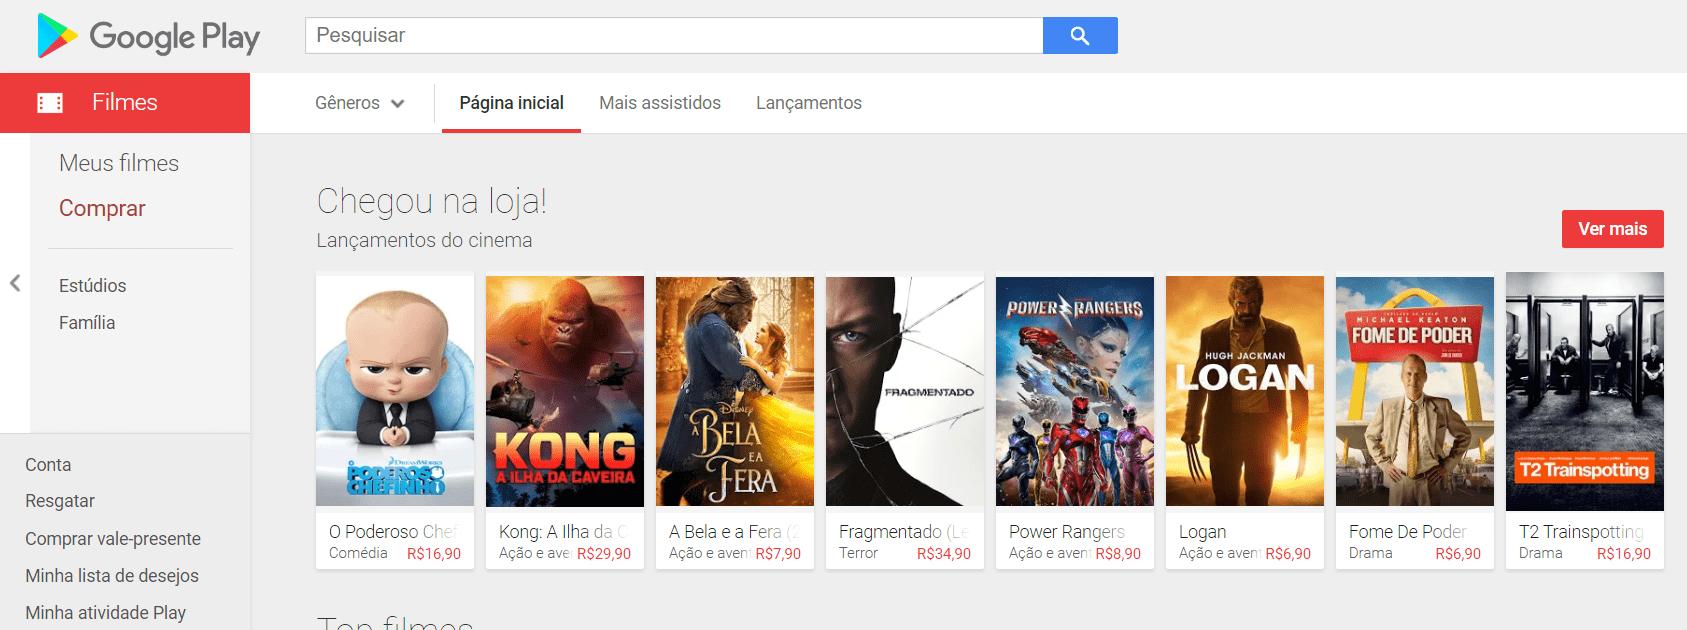 alternativas-ao-netflix-googleplay